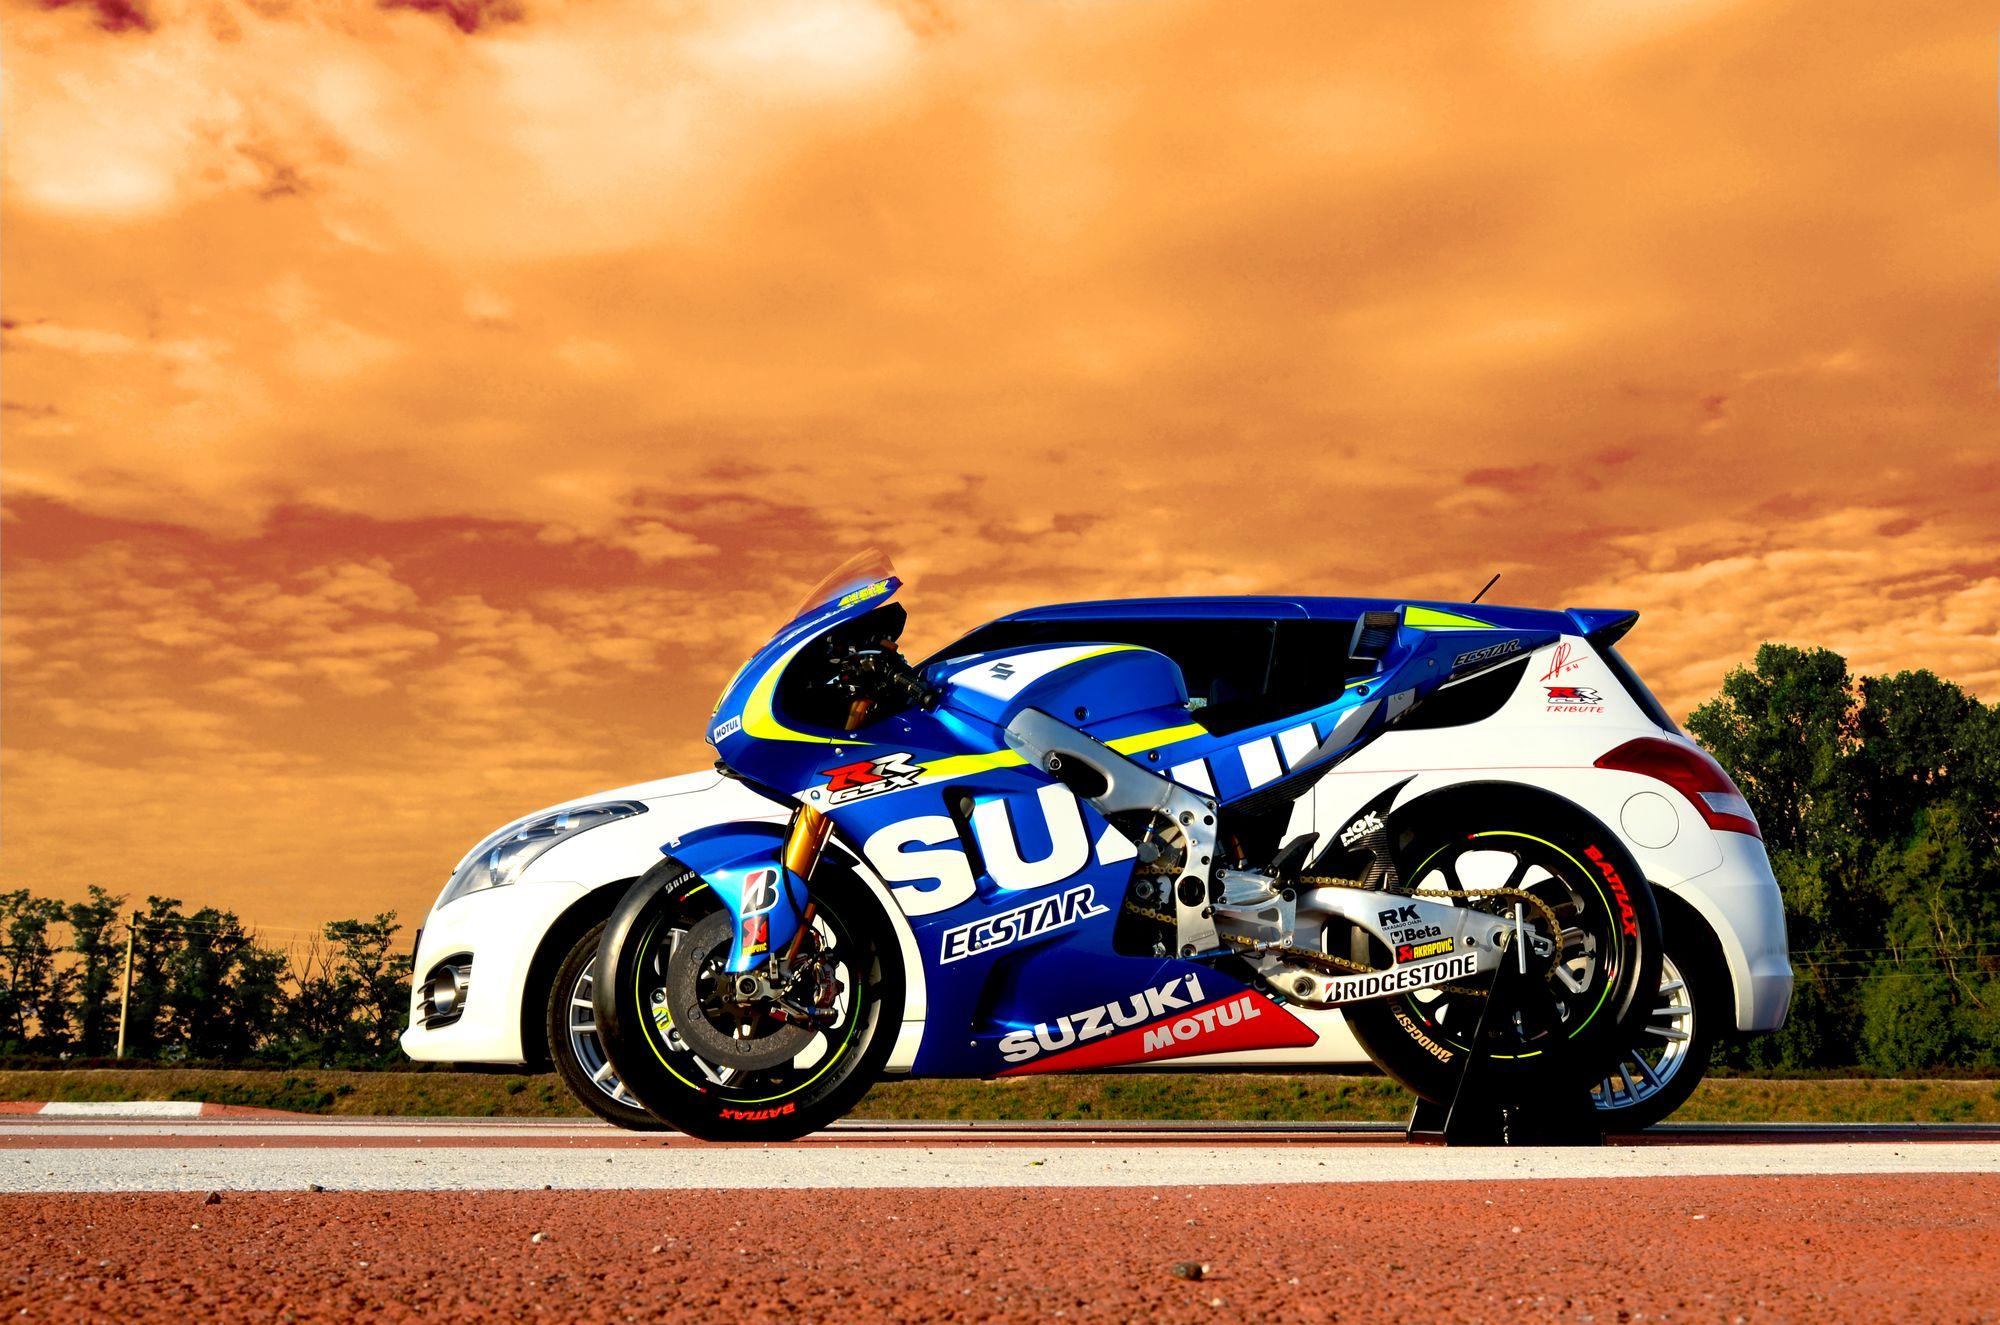 Suzuki Swift GSX-RR Tribute